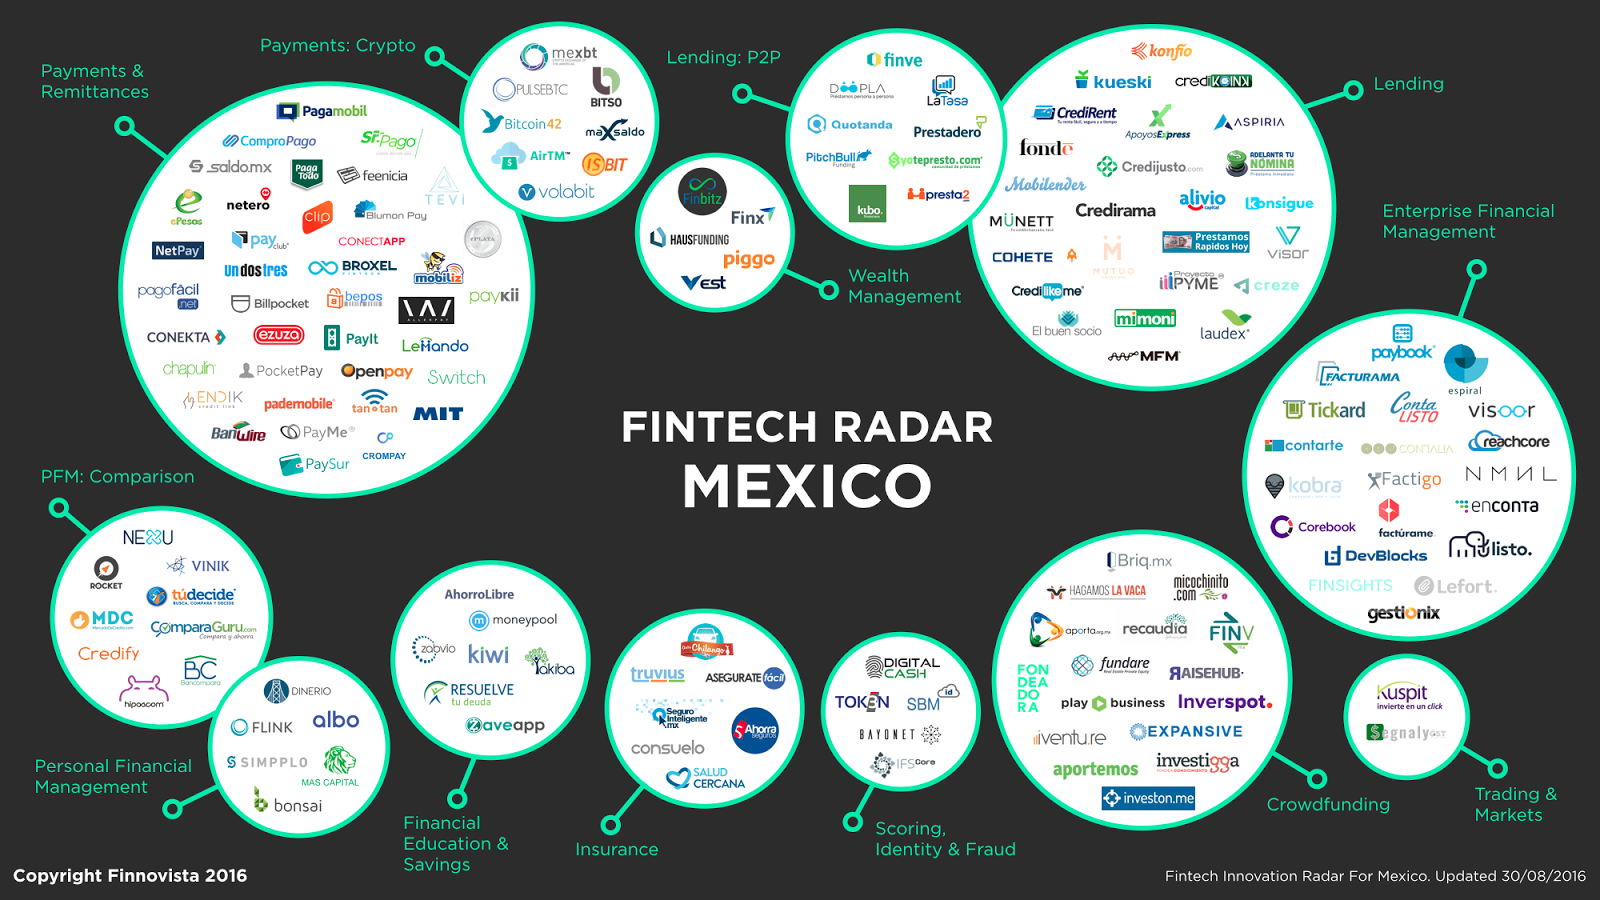 Fintech Radar México